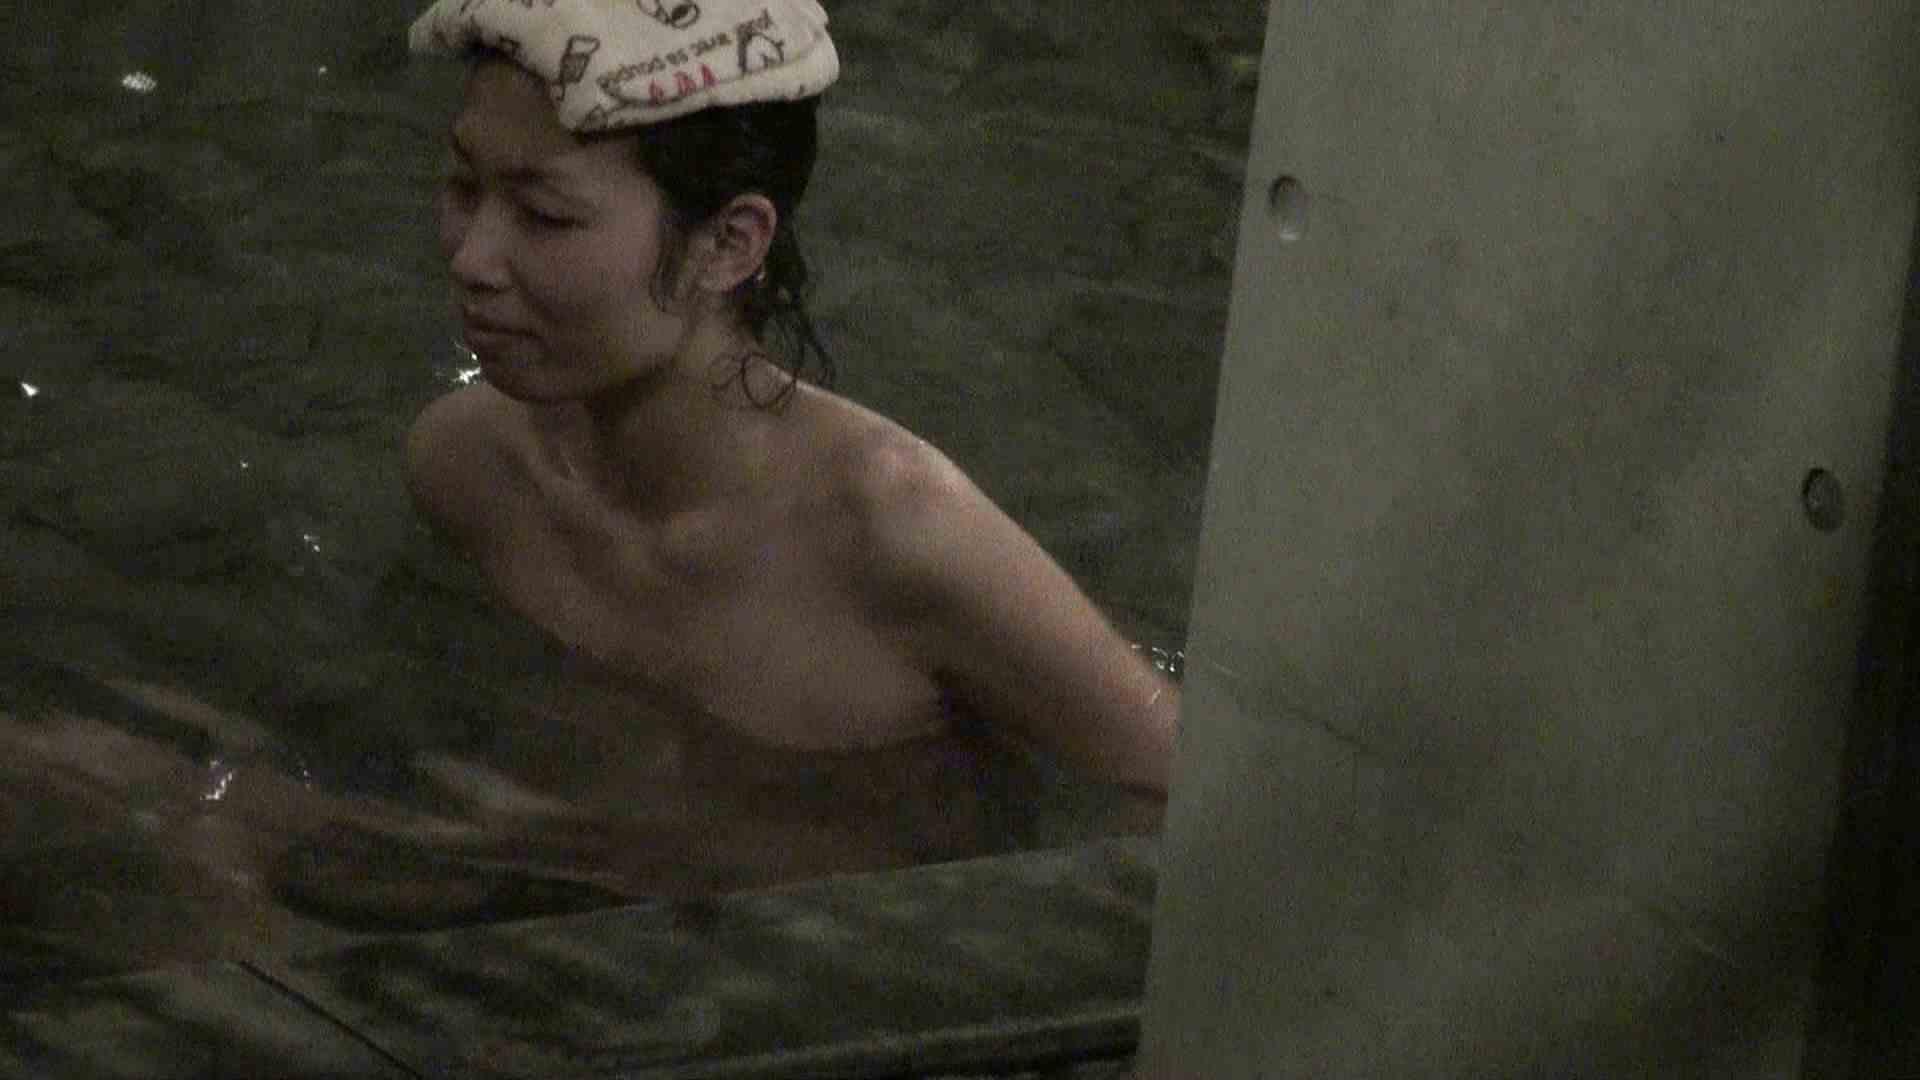 Aquaな露天風呂Vol.399 0   0  81連発 55